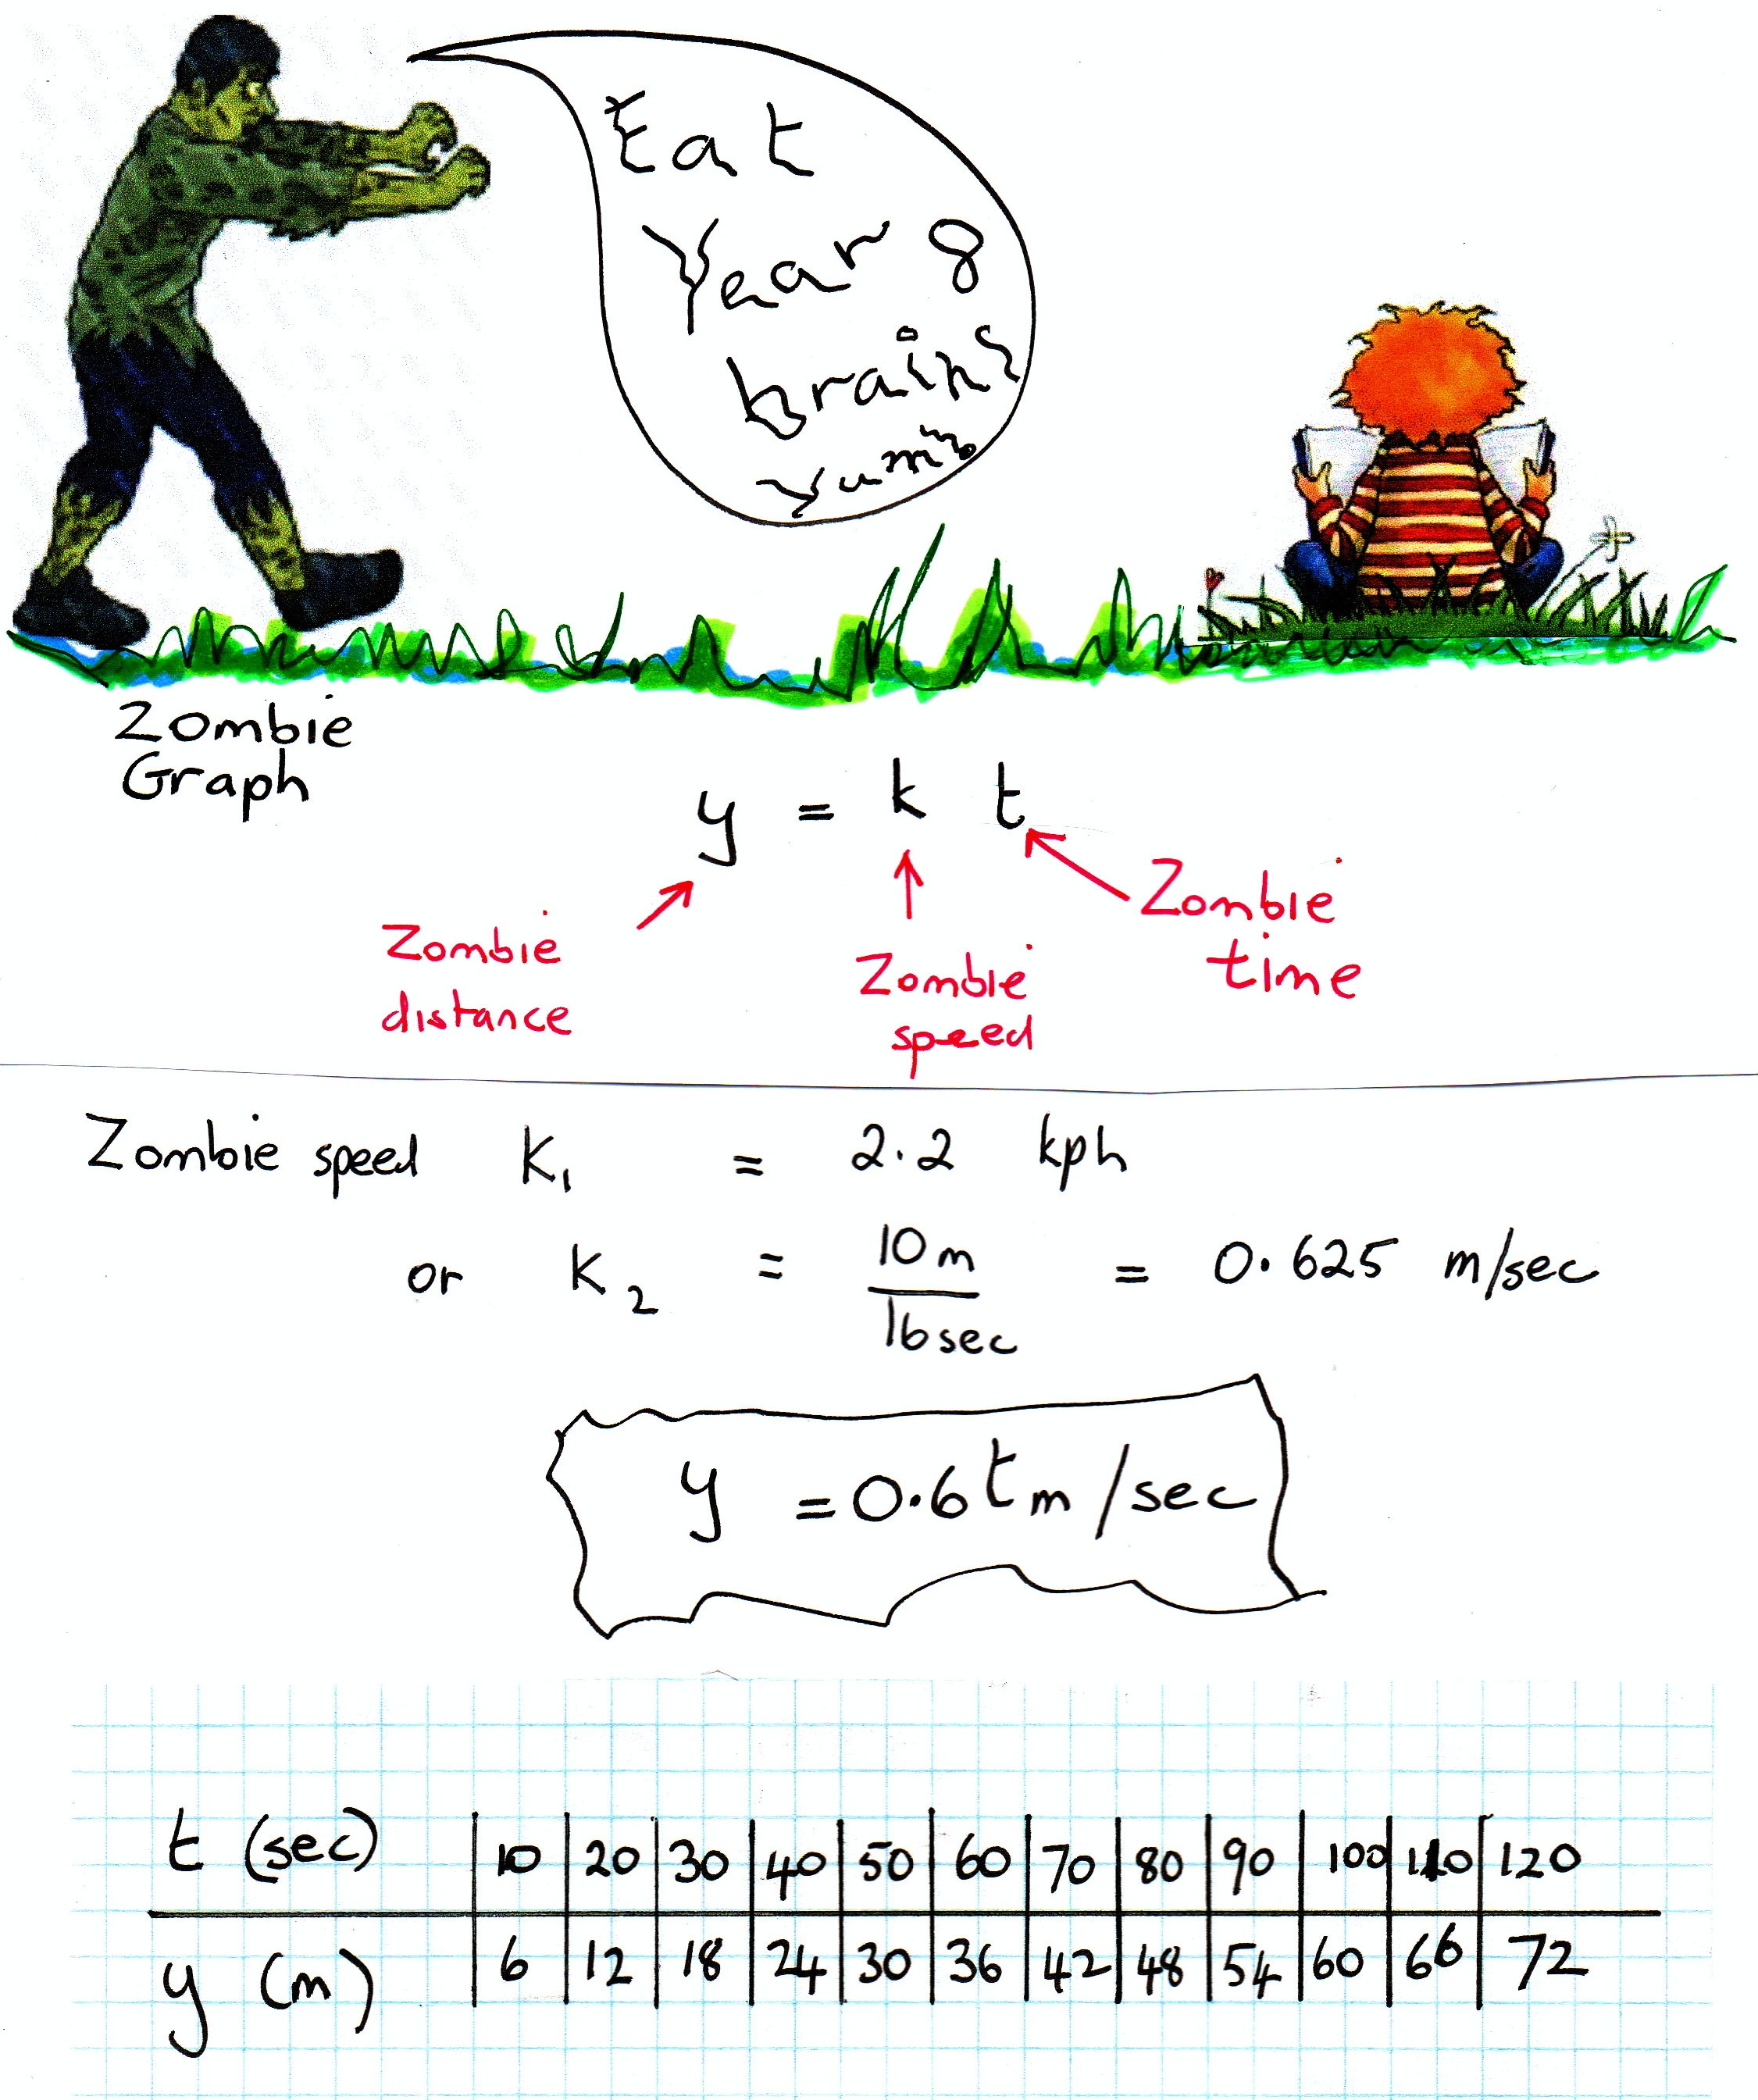 Funny Zombie Math